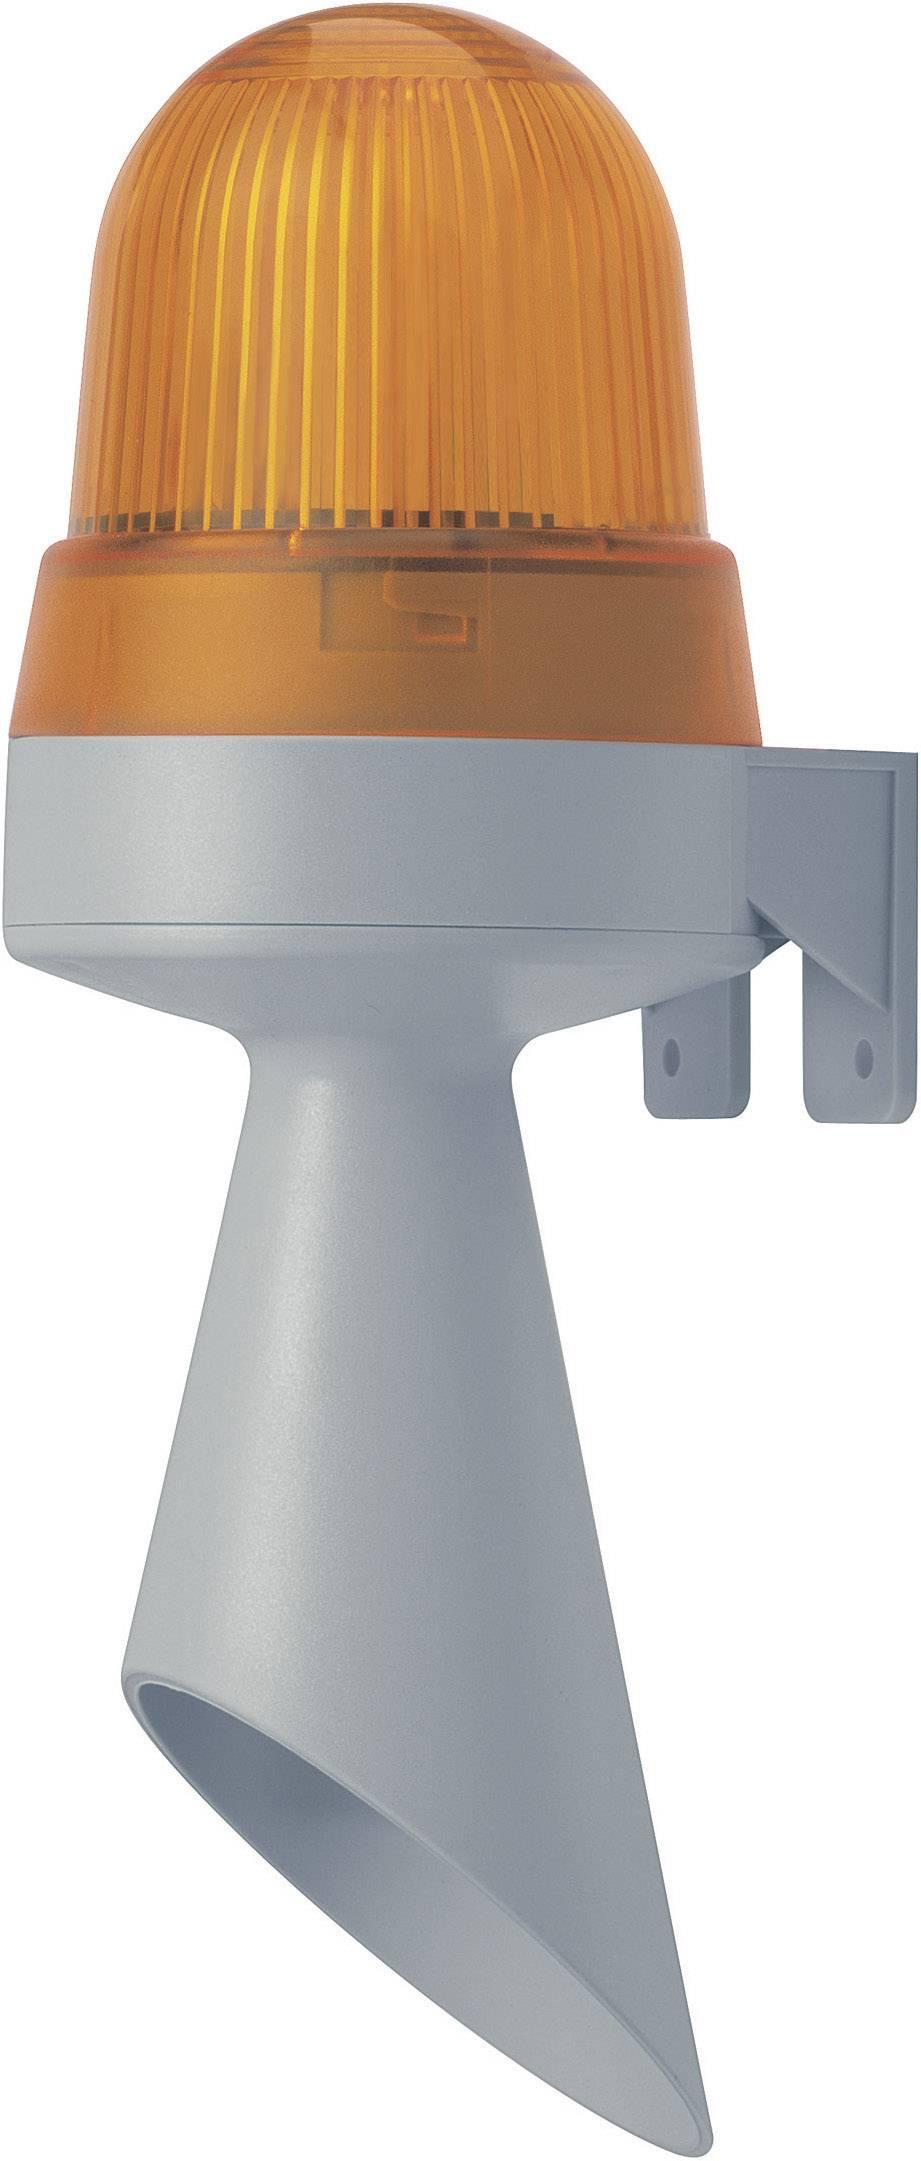 Siréna s LED Werma 424.120.75, 24 V/DC, IP65, žlutá